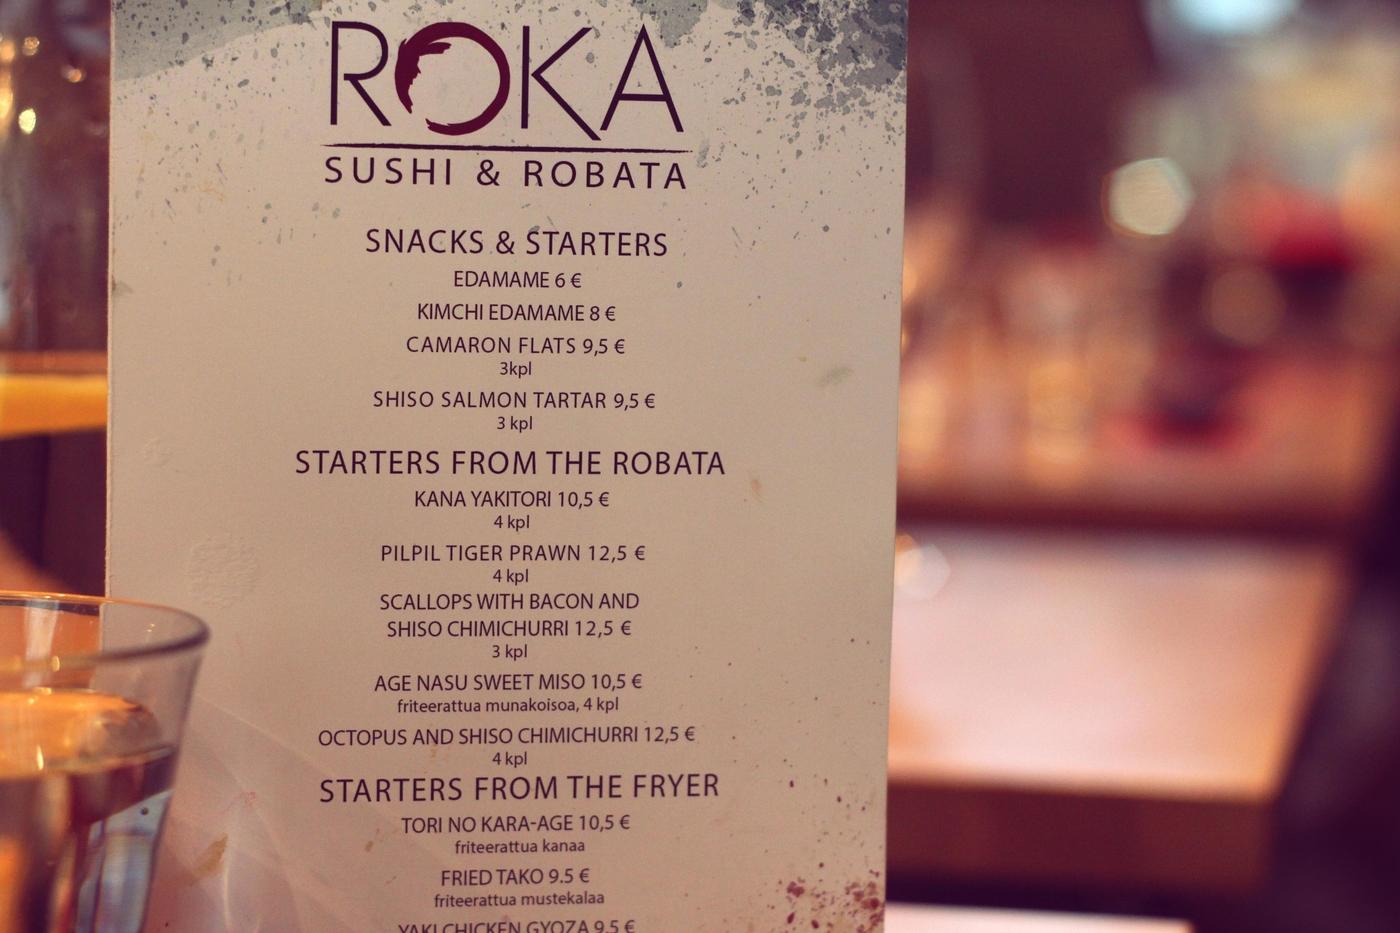 ROKA Sushi & Robata